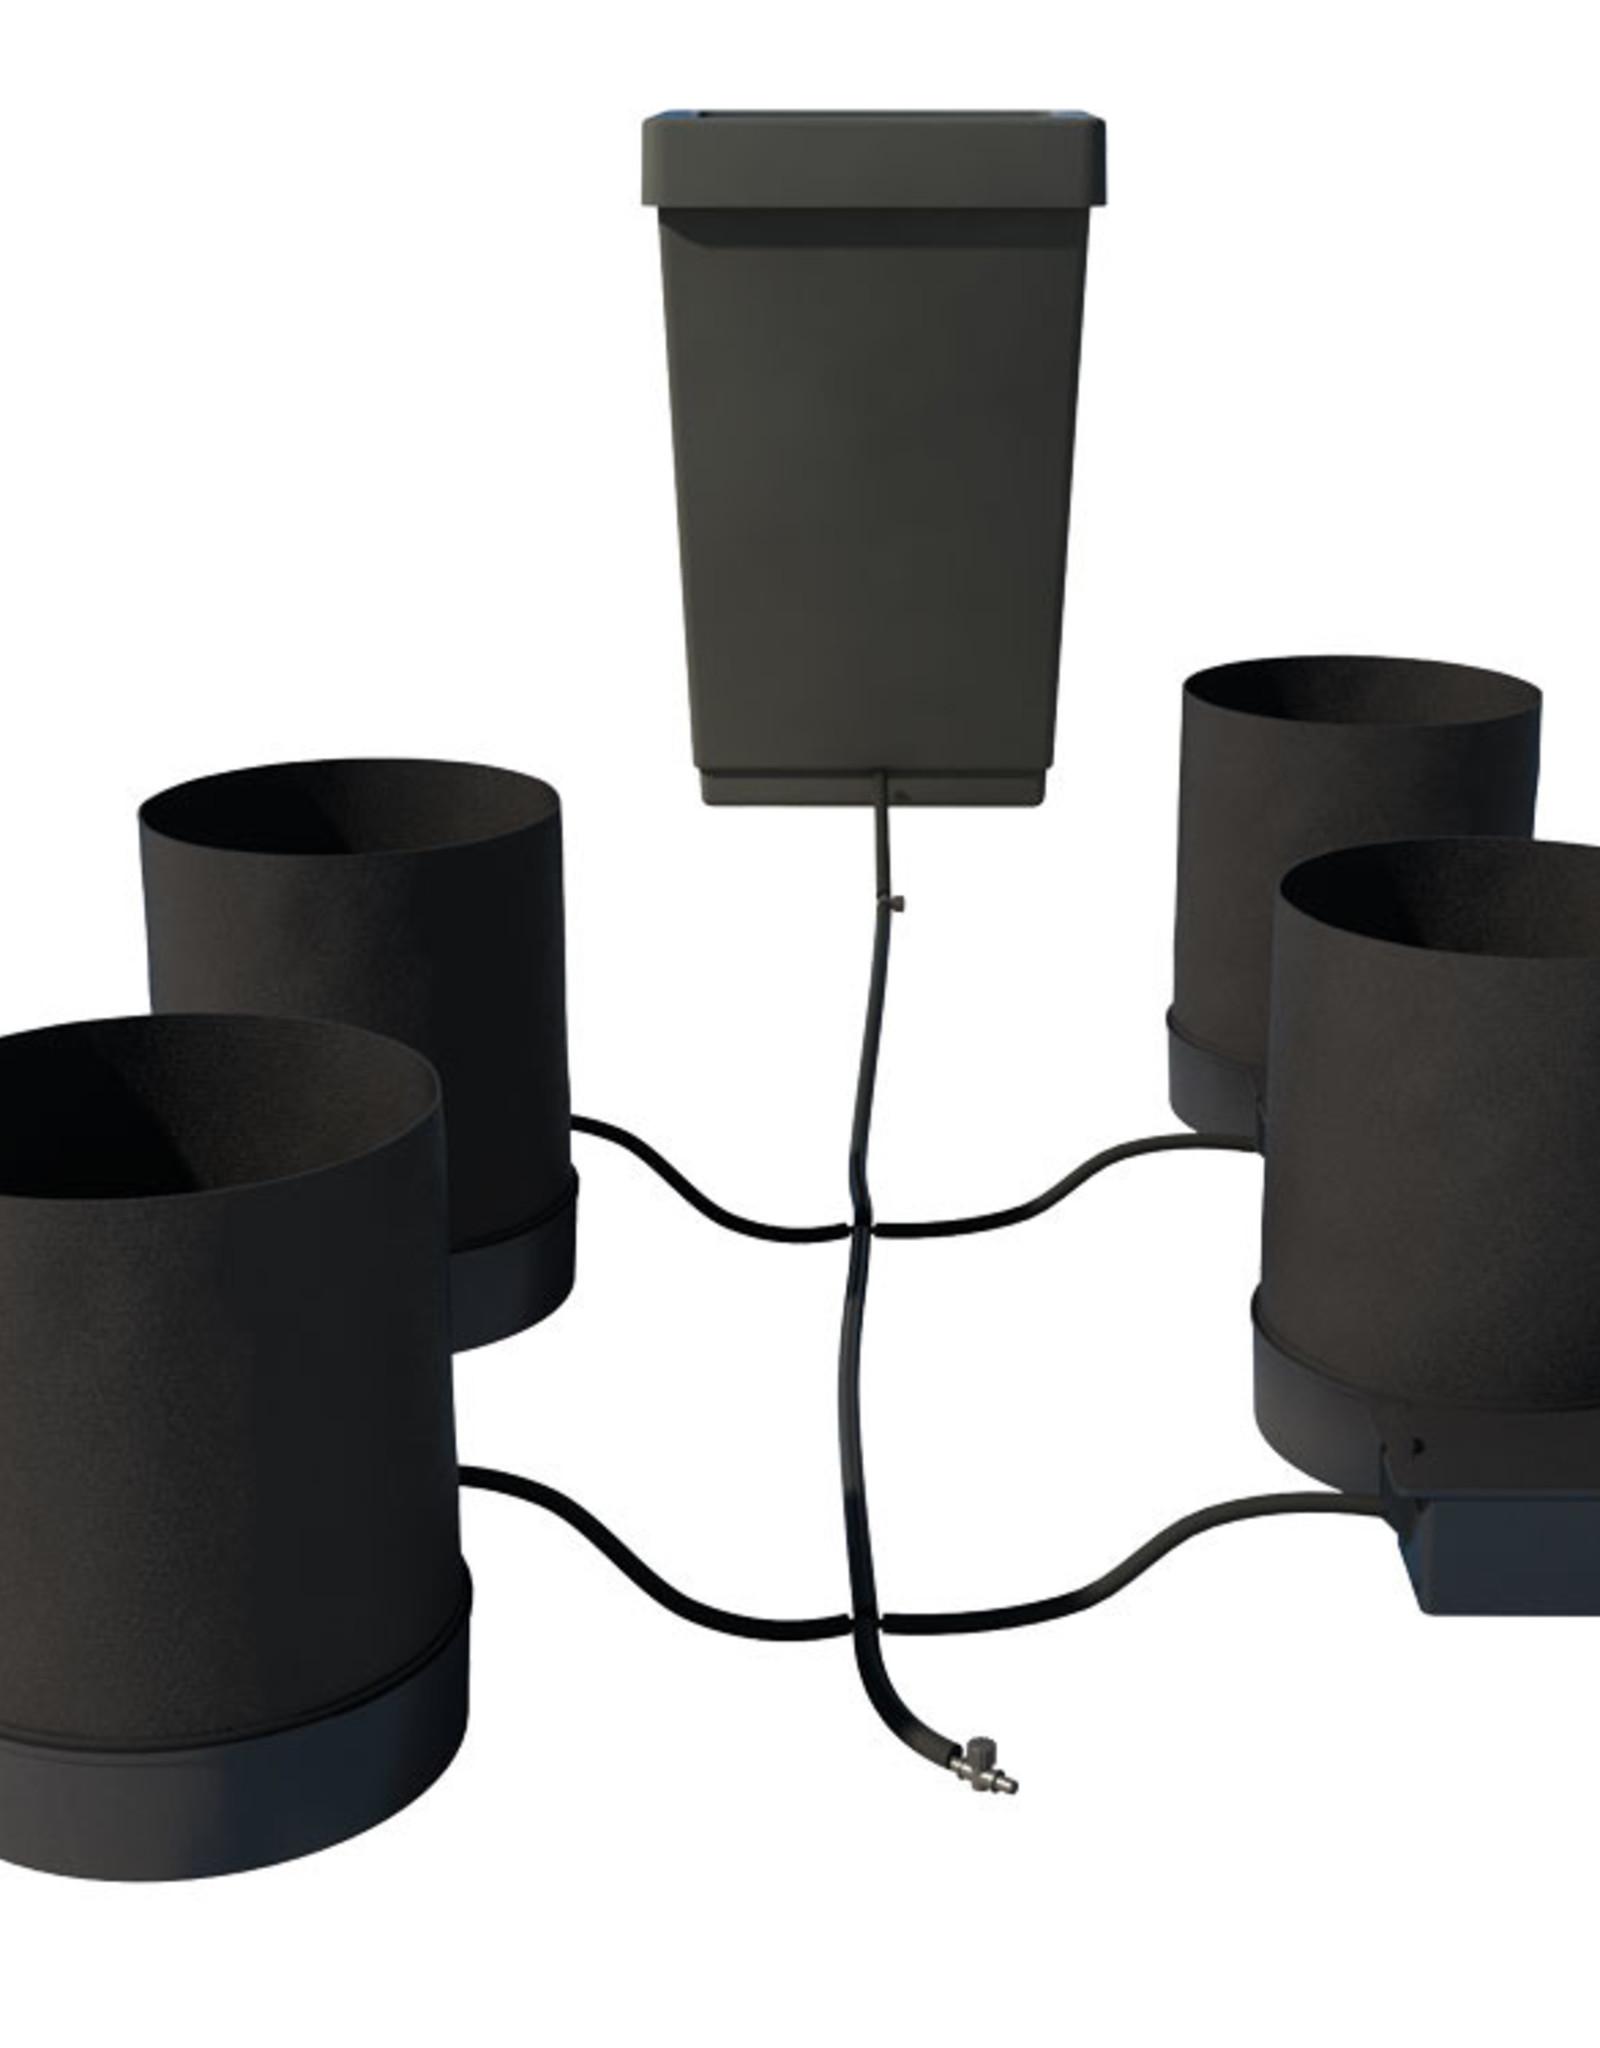 Autopot SmartPot 4 System